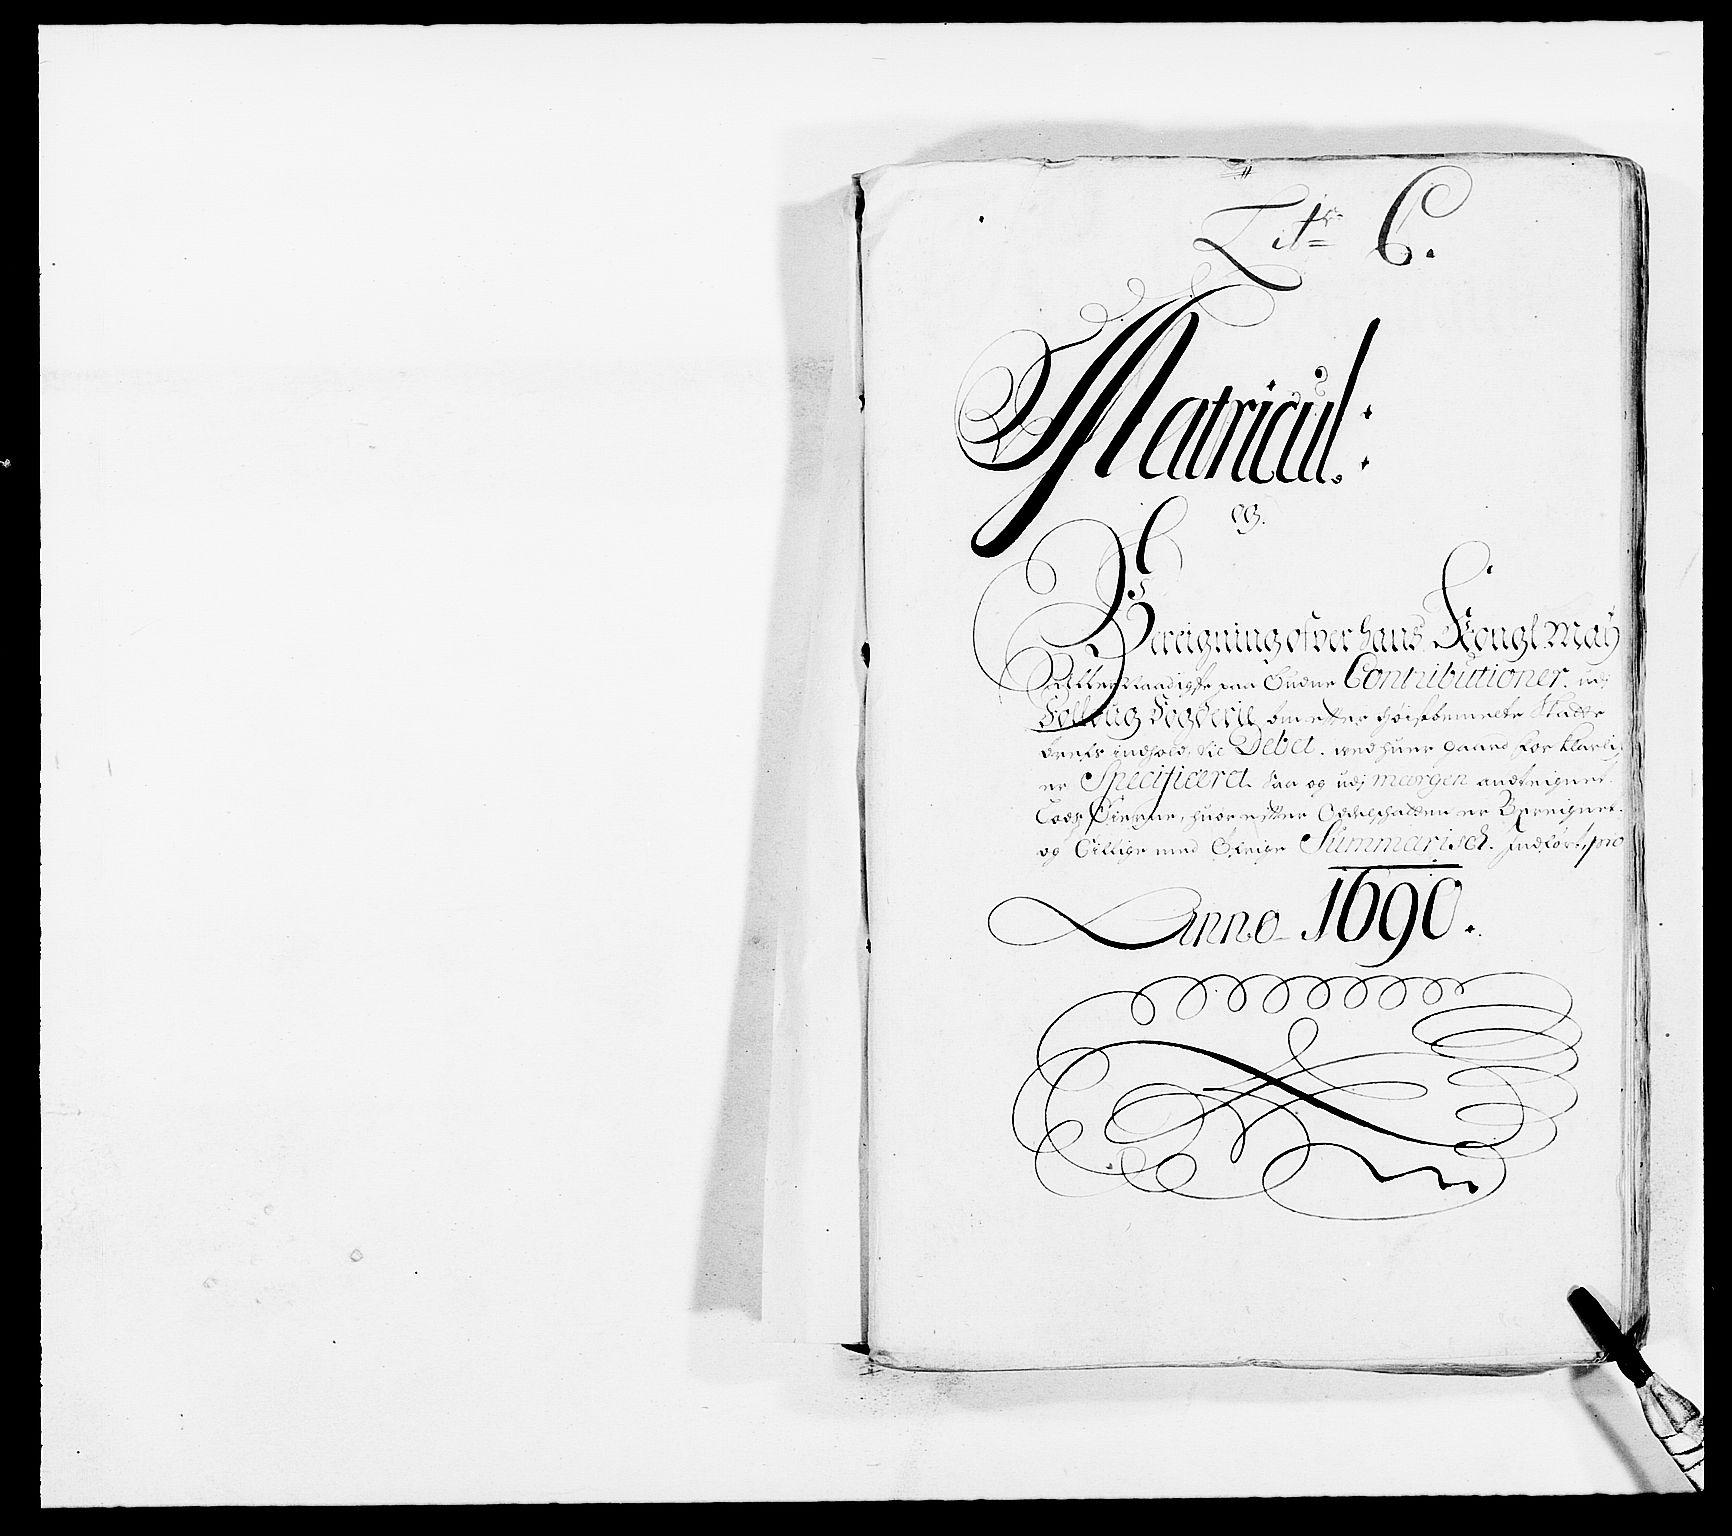 RA, Rentekammeret inntil 1814, Reviderte regnskaper, Fogderegnskap, R09/L0435: Fogderegnskap Follo, 1689-1691, s. 218